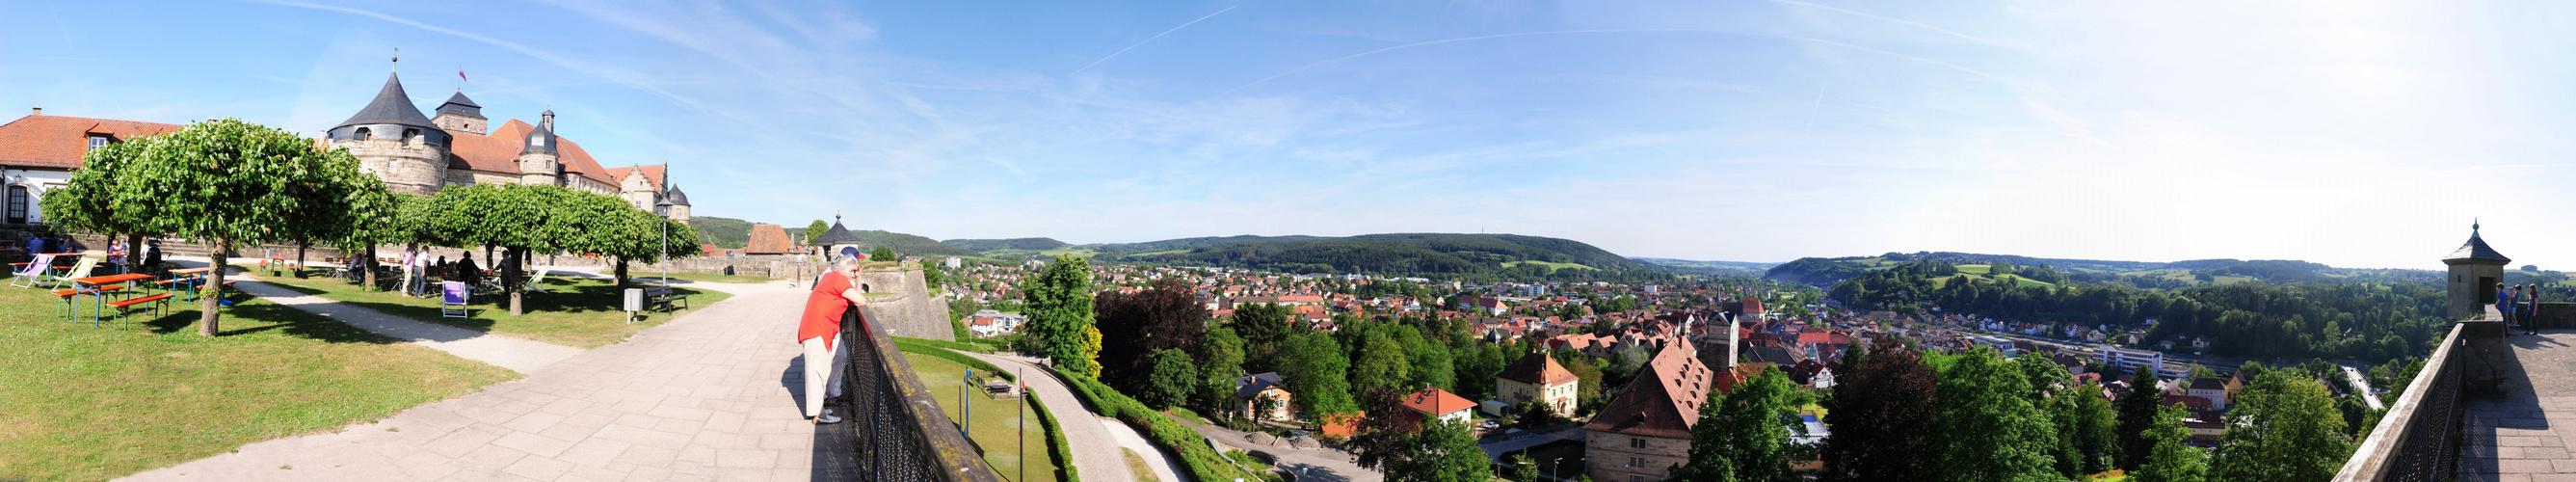 Festung Rosenberg, Kronach